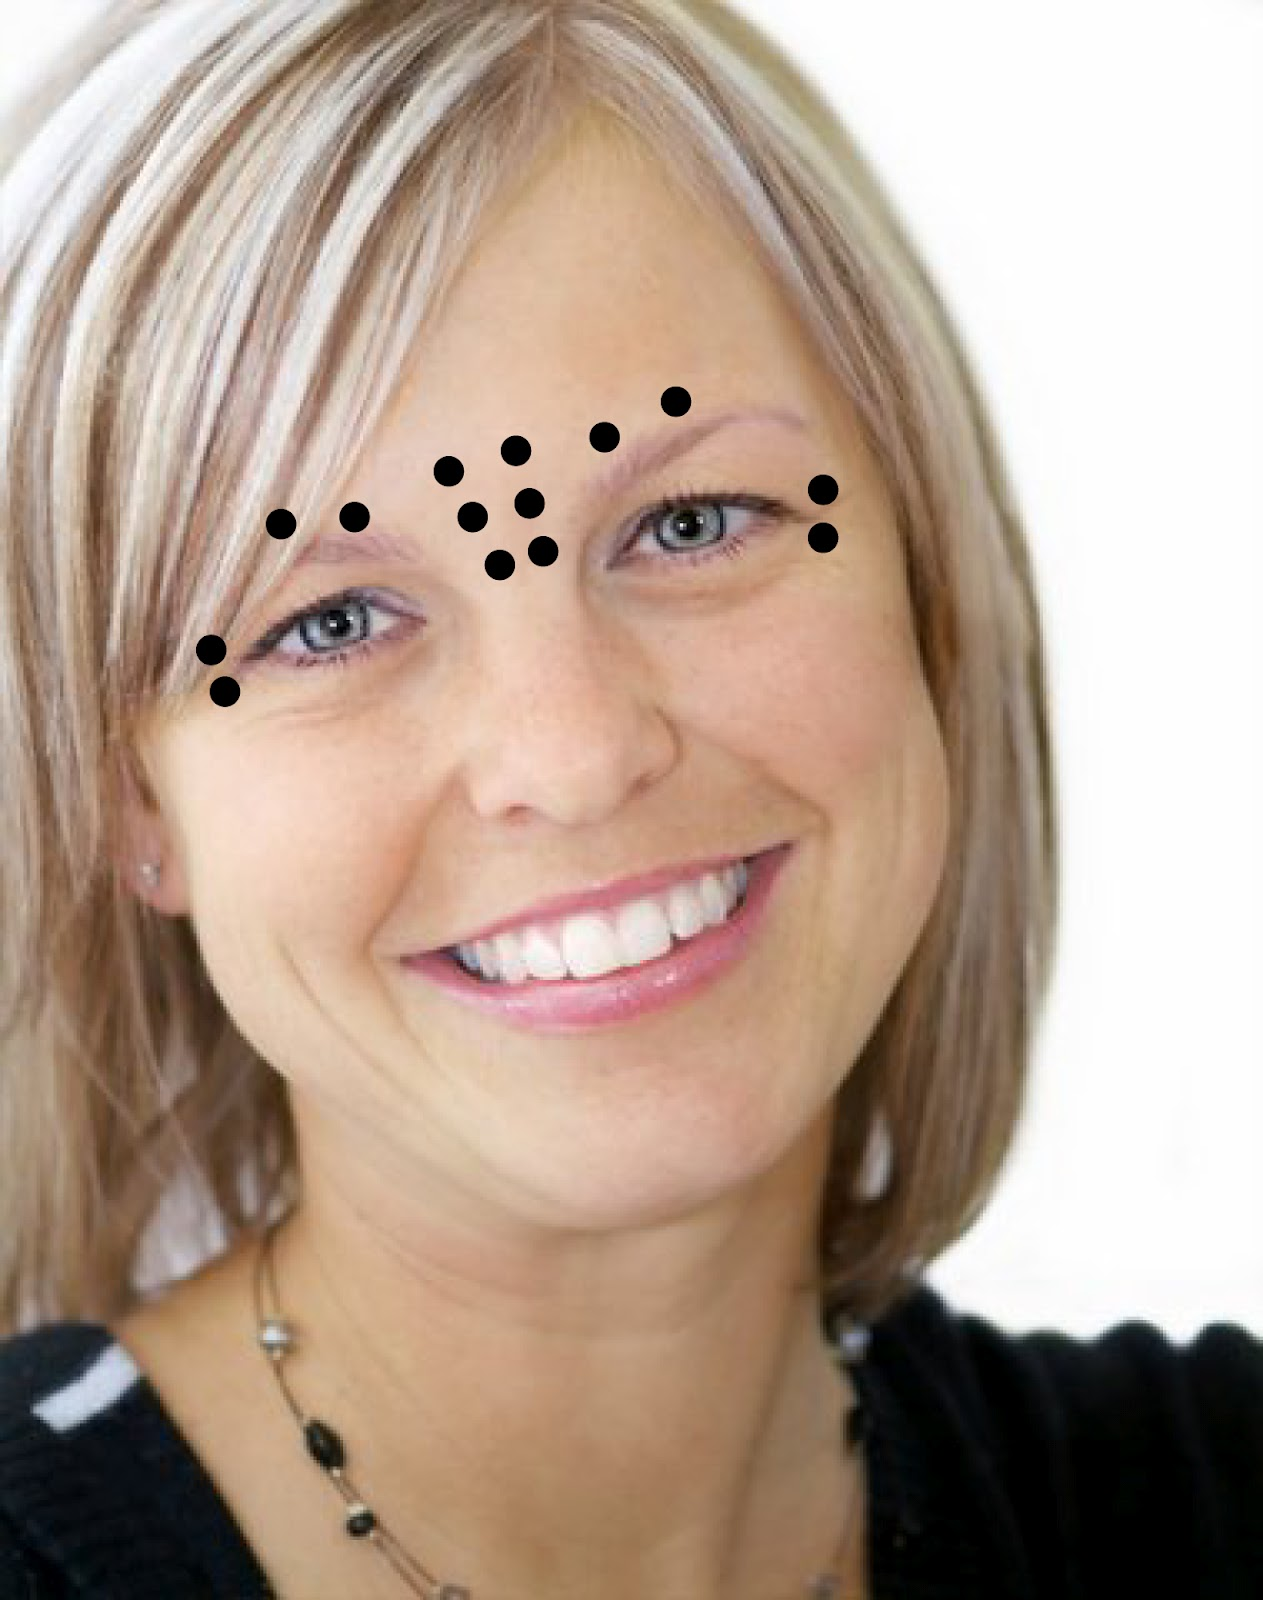 The Official Rucker Md Blog Avoiding Botox Blunders